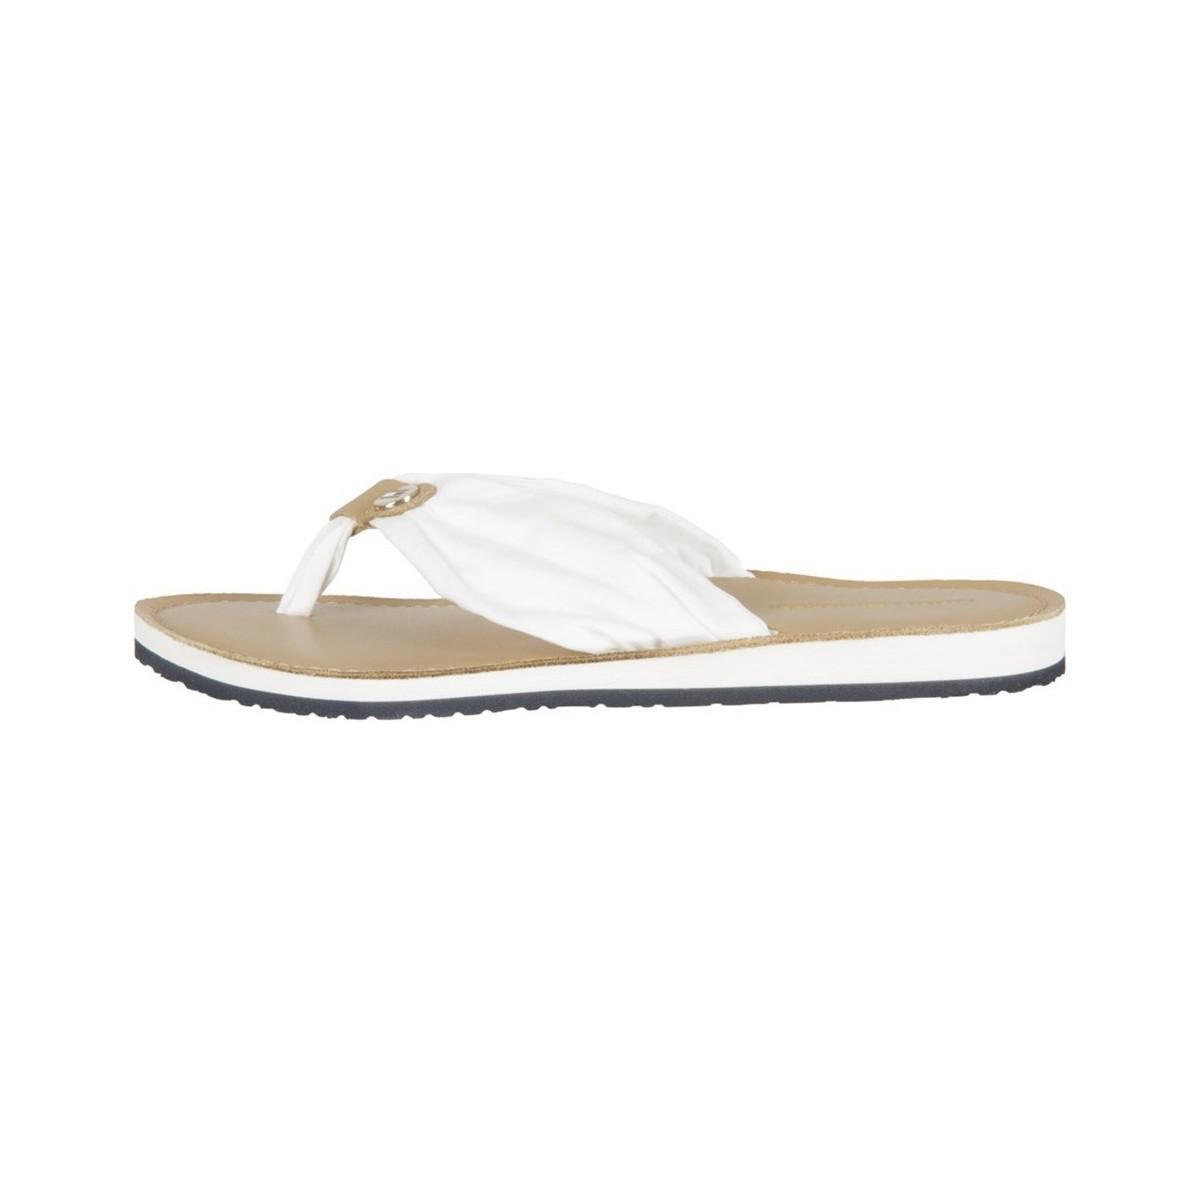 818946cad Tommy Hilfiger Monica 14d3 Women s Flip Flops   Sandals (shoes) In ...